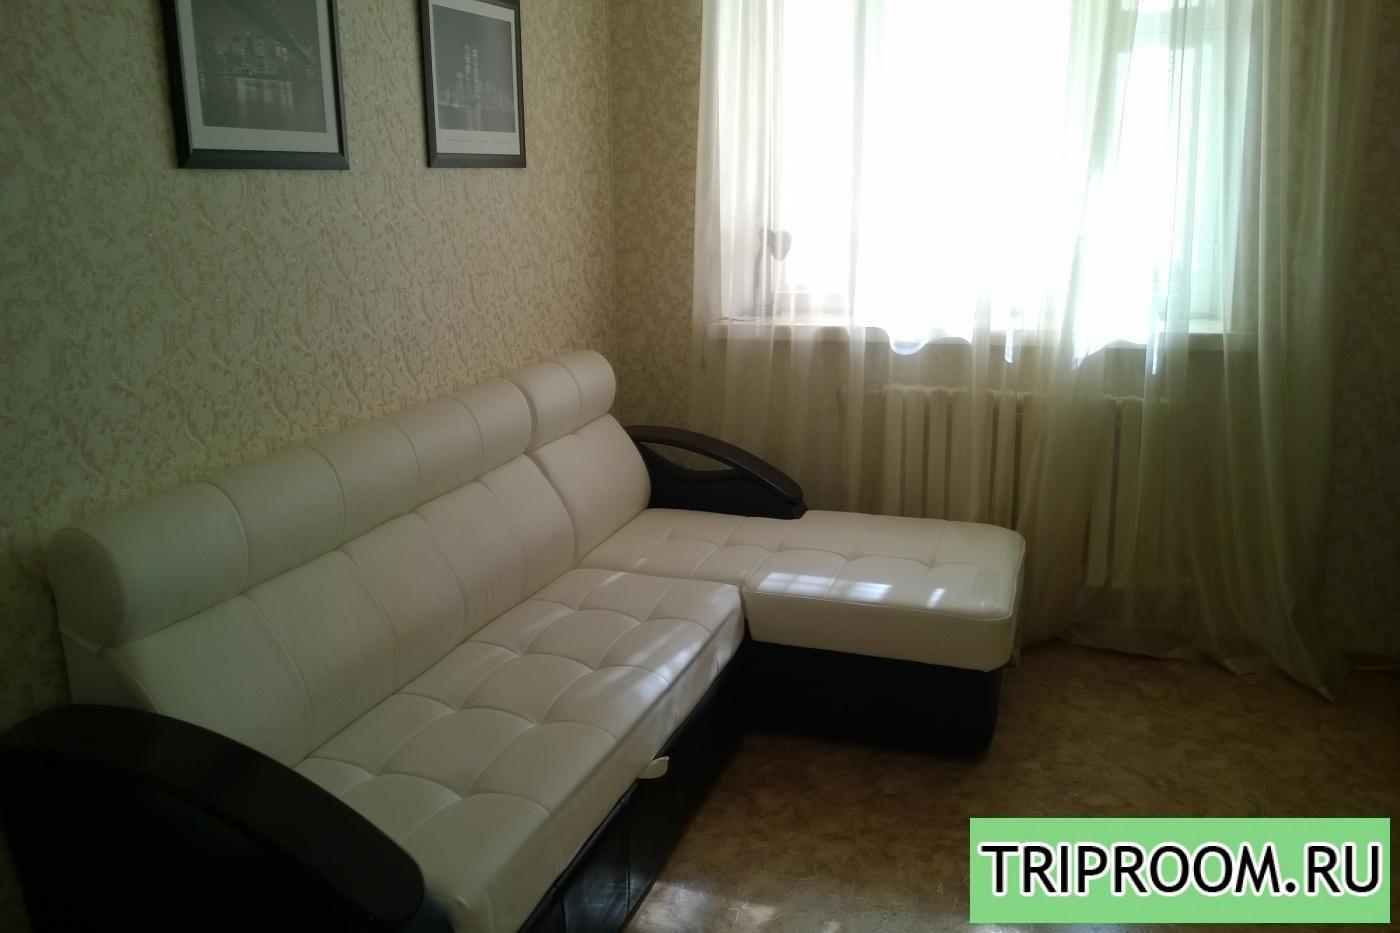 1-комнатная квартира посуточно (вариант № 6490), ул. Симонова улица, фото № 1